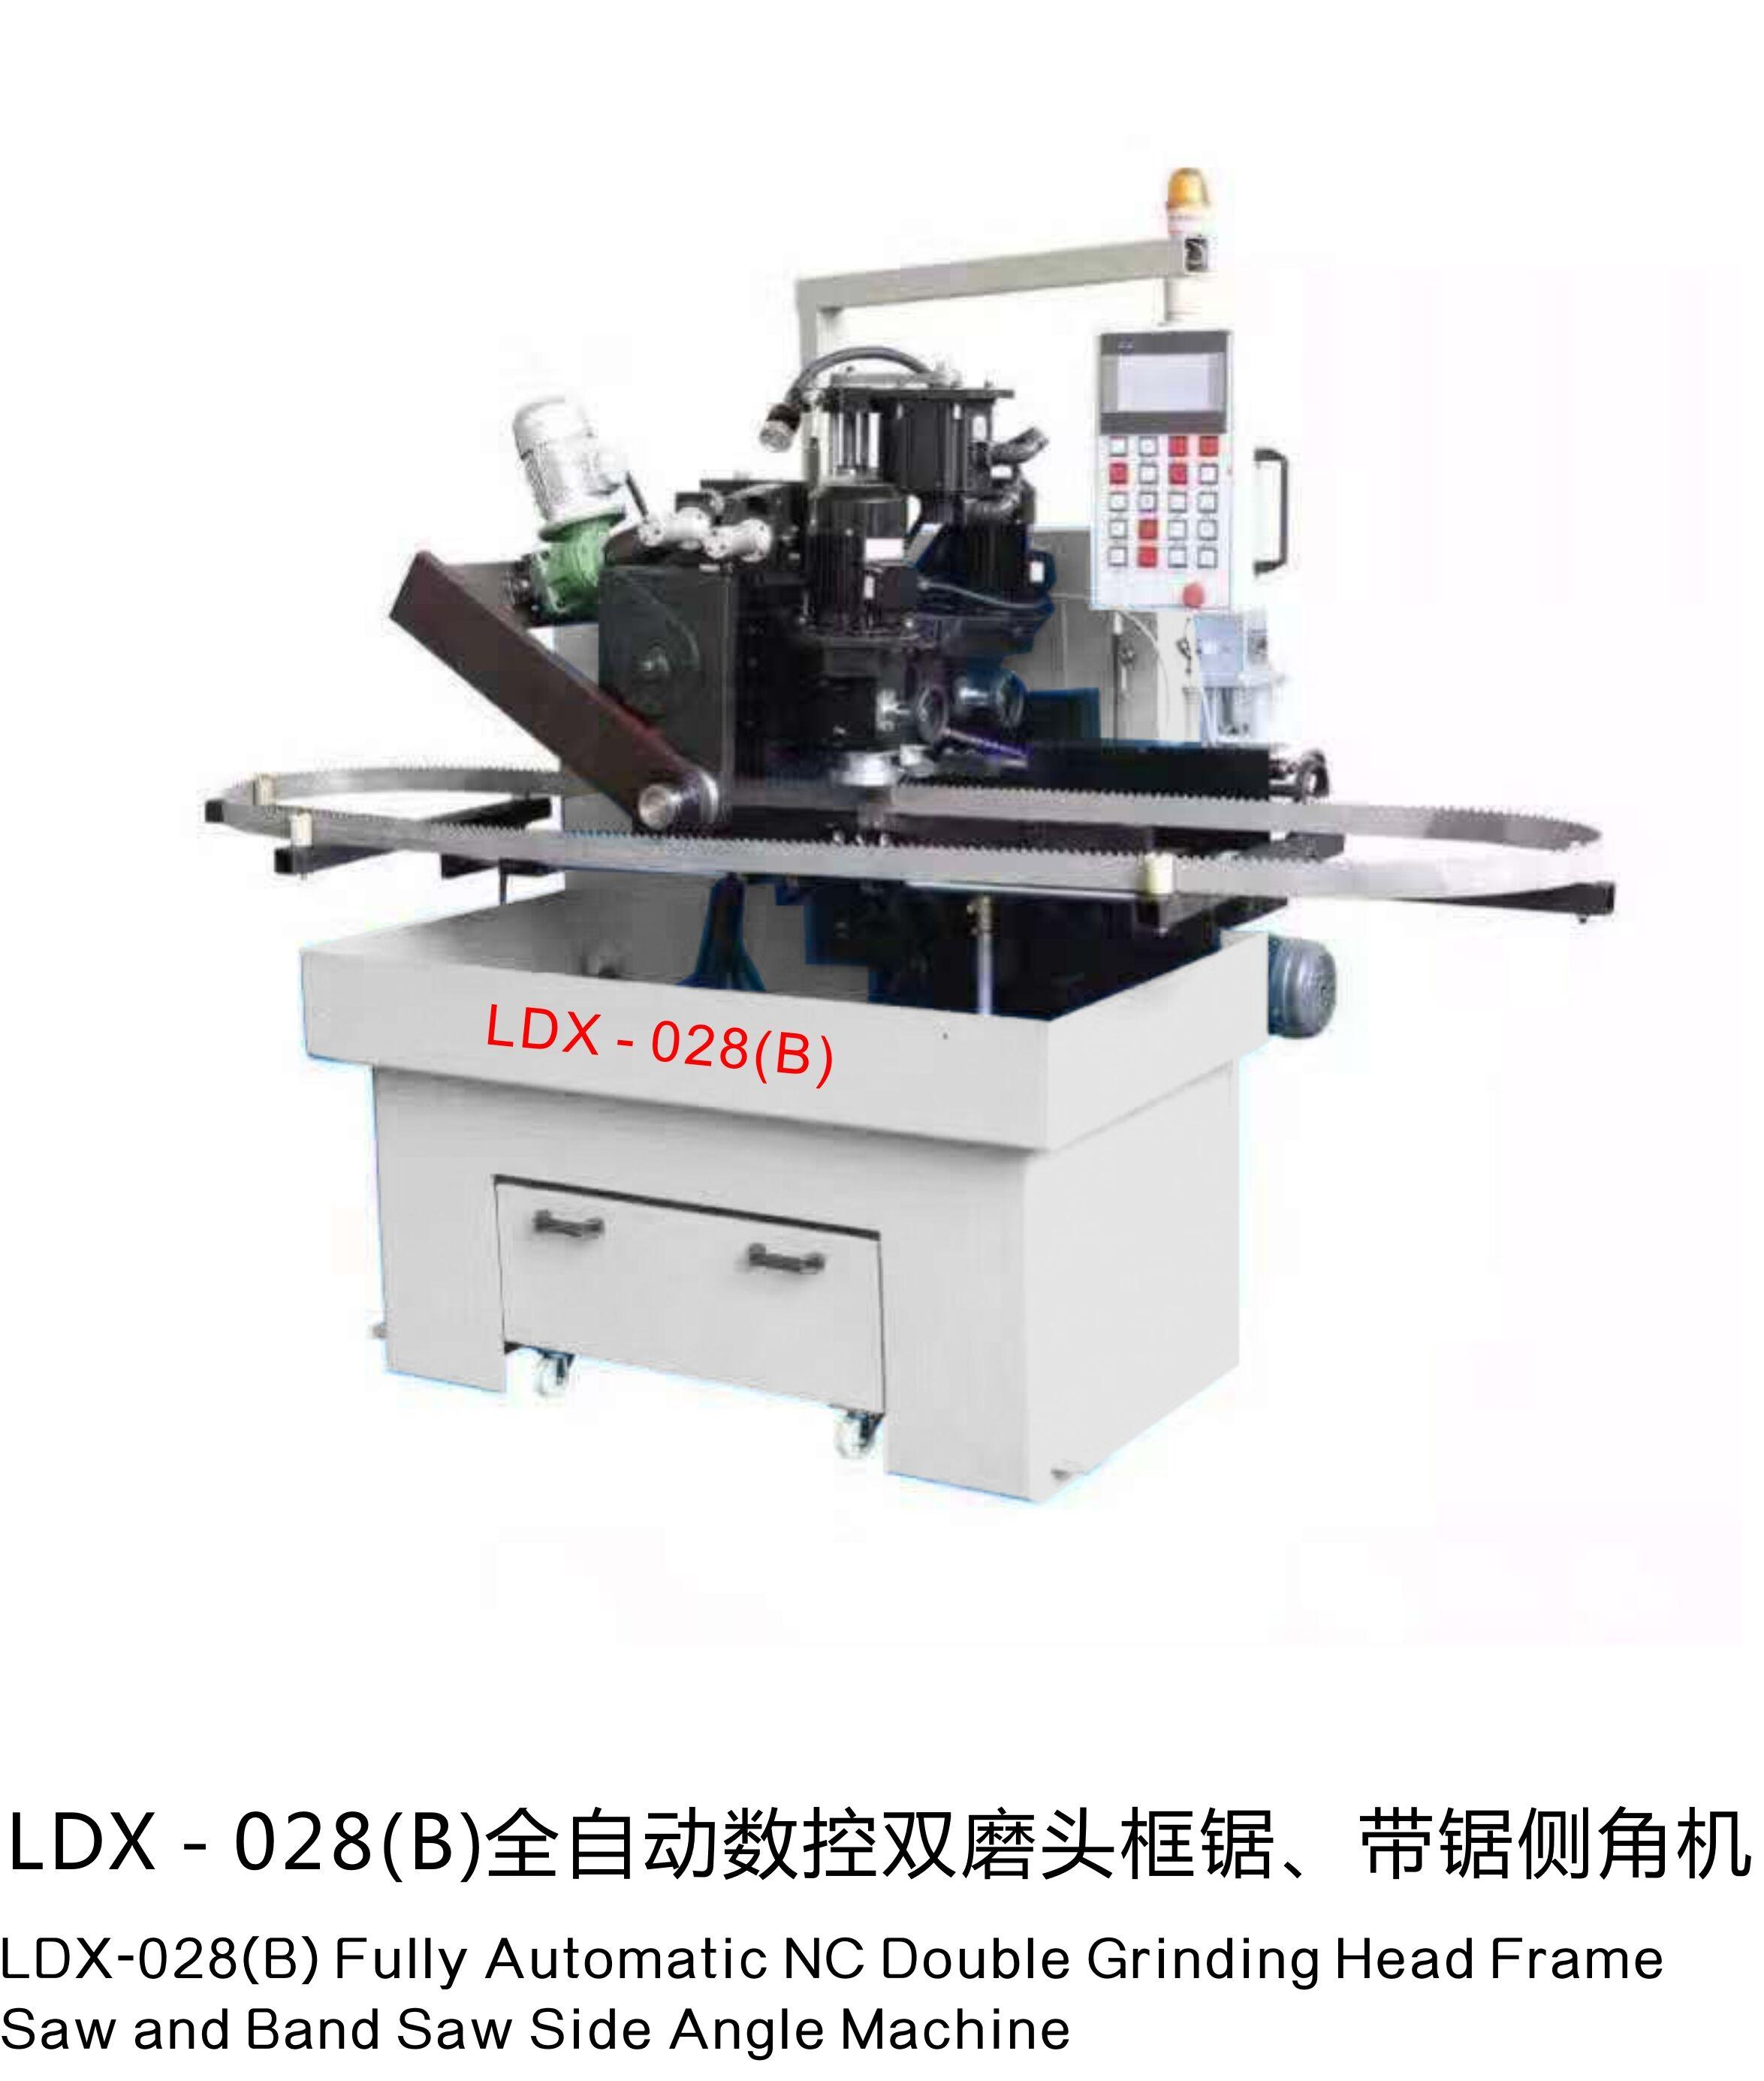 LDX-028(B)全自動數控雙磨頭框鋸、帶鋸側角機